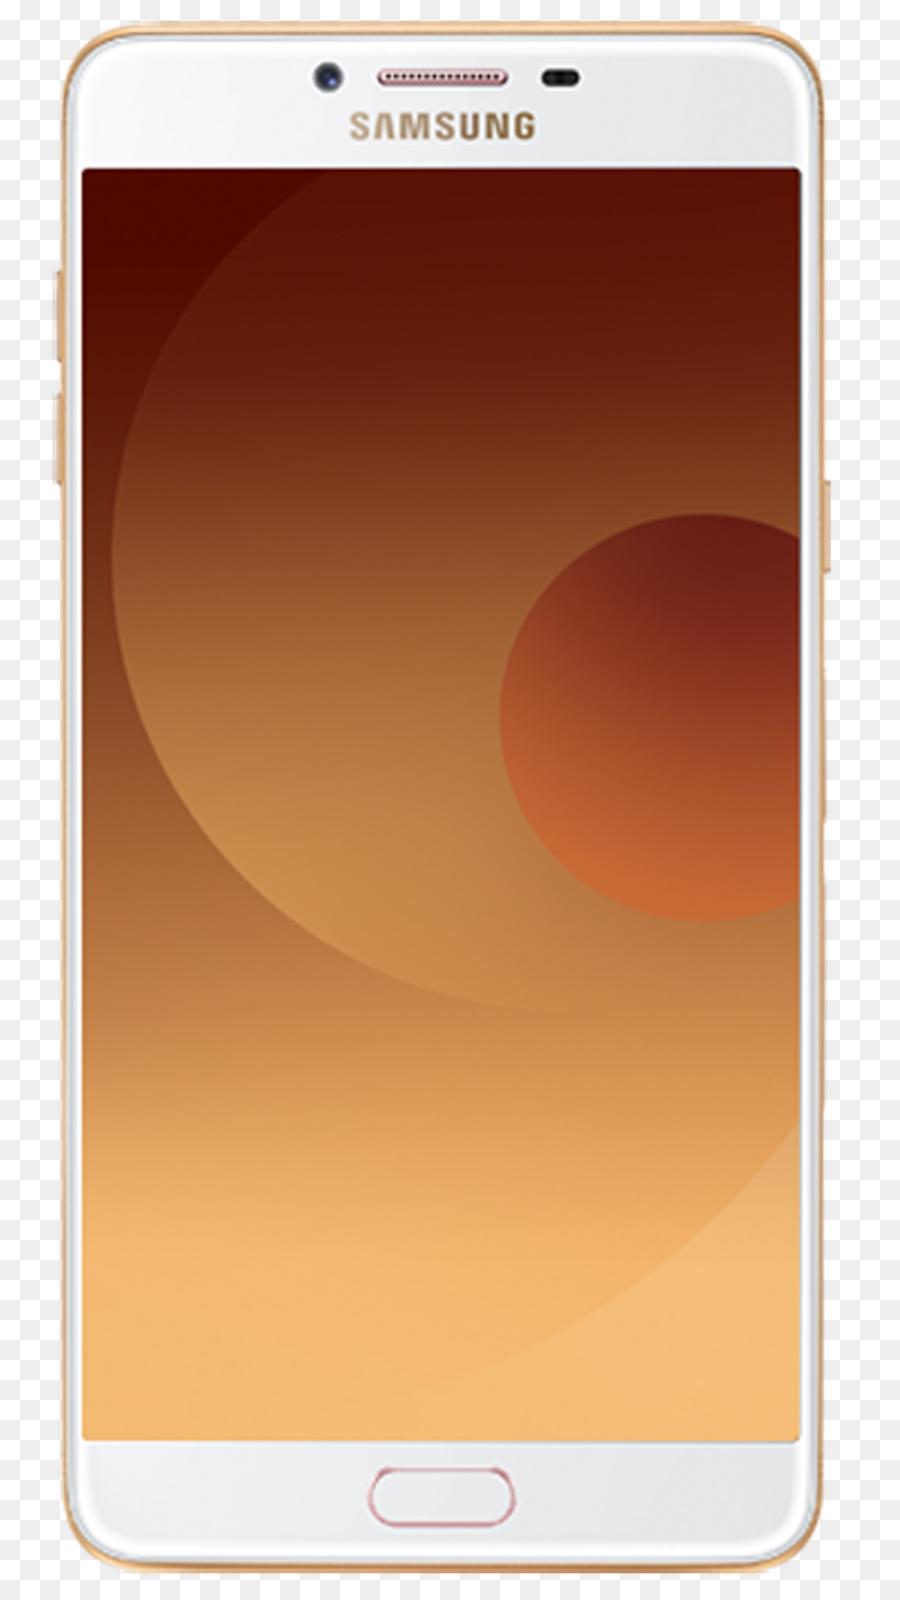 Samsung Galaxy C9 Samsung Galaxy J7 Pro Super Amoled Desktop